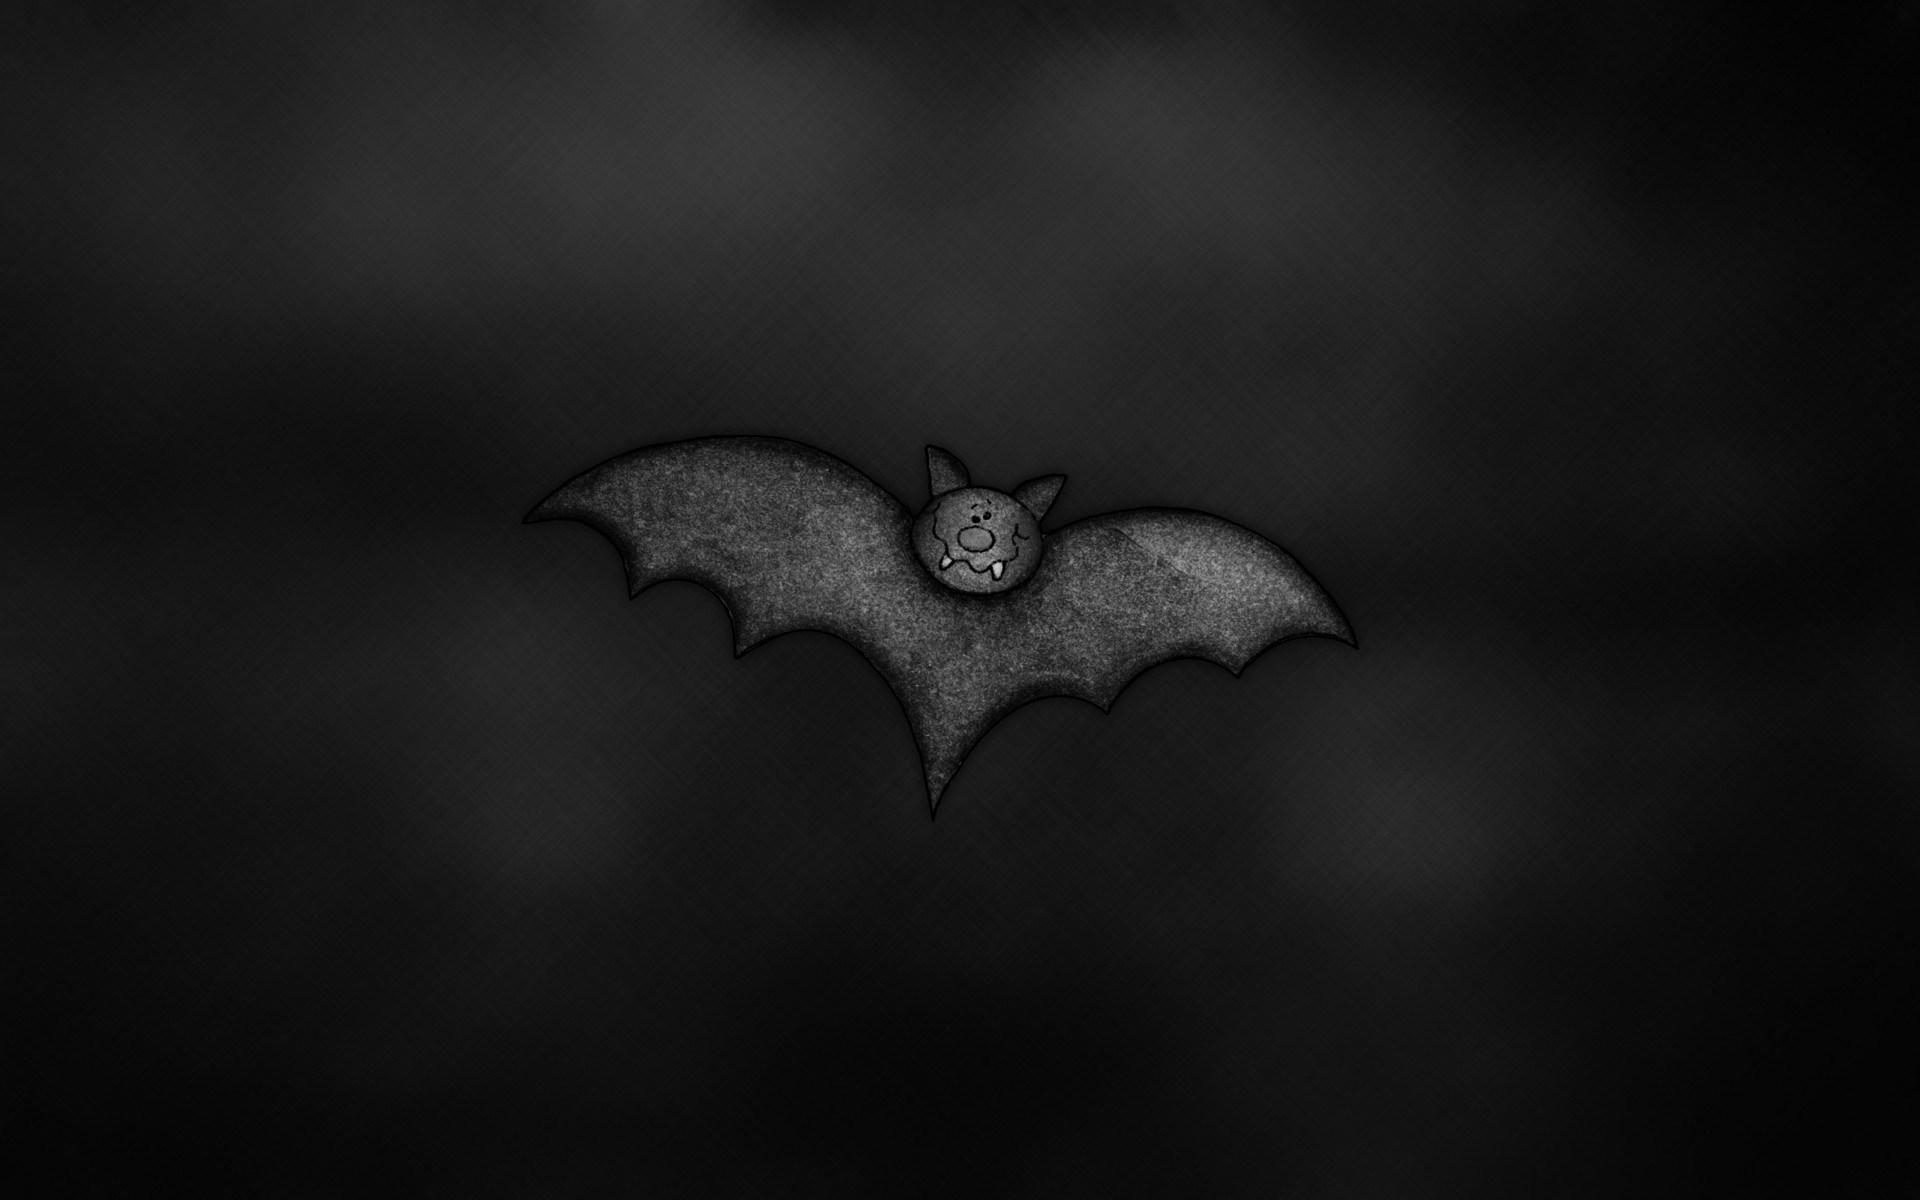 wallpaper.wiki-Funny-Bat-Computer-Photo-PIC-WPC009840